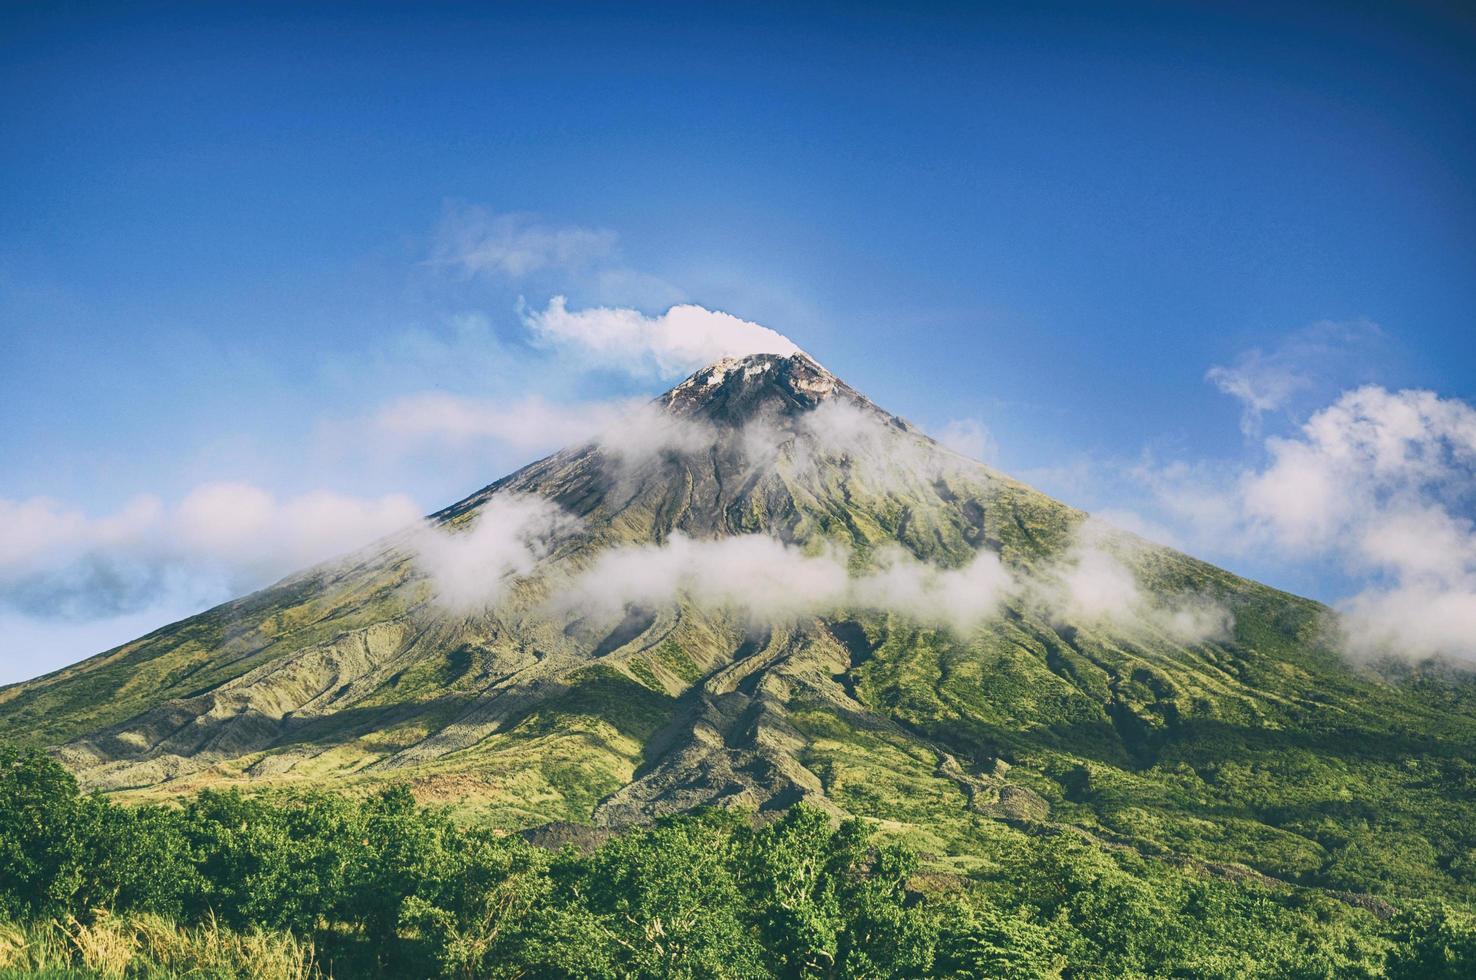 groene berg onder de blauwe hemel foto